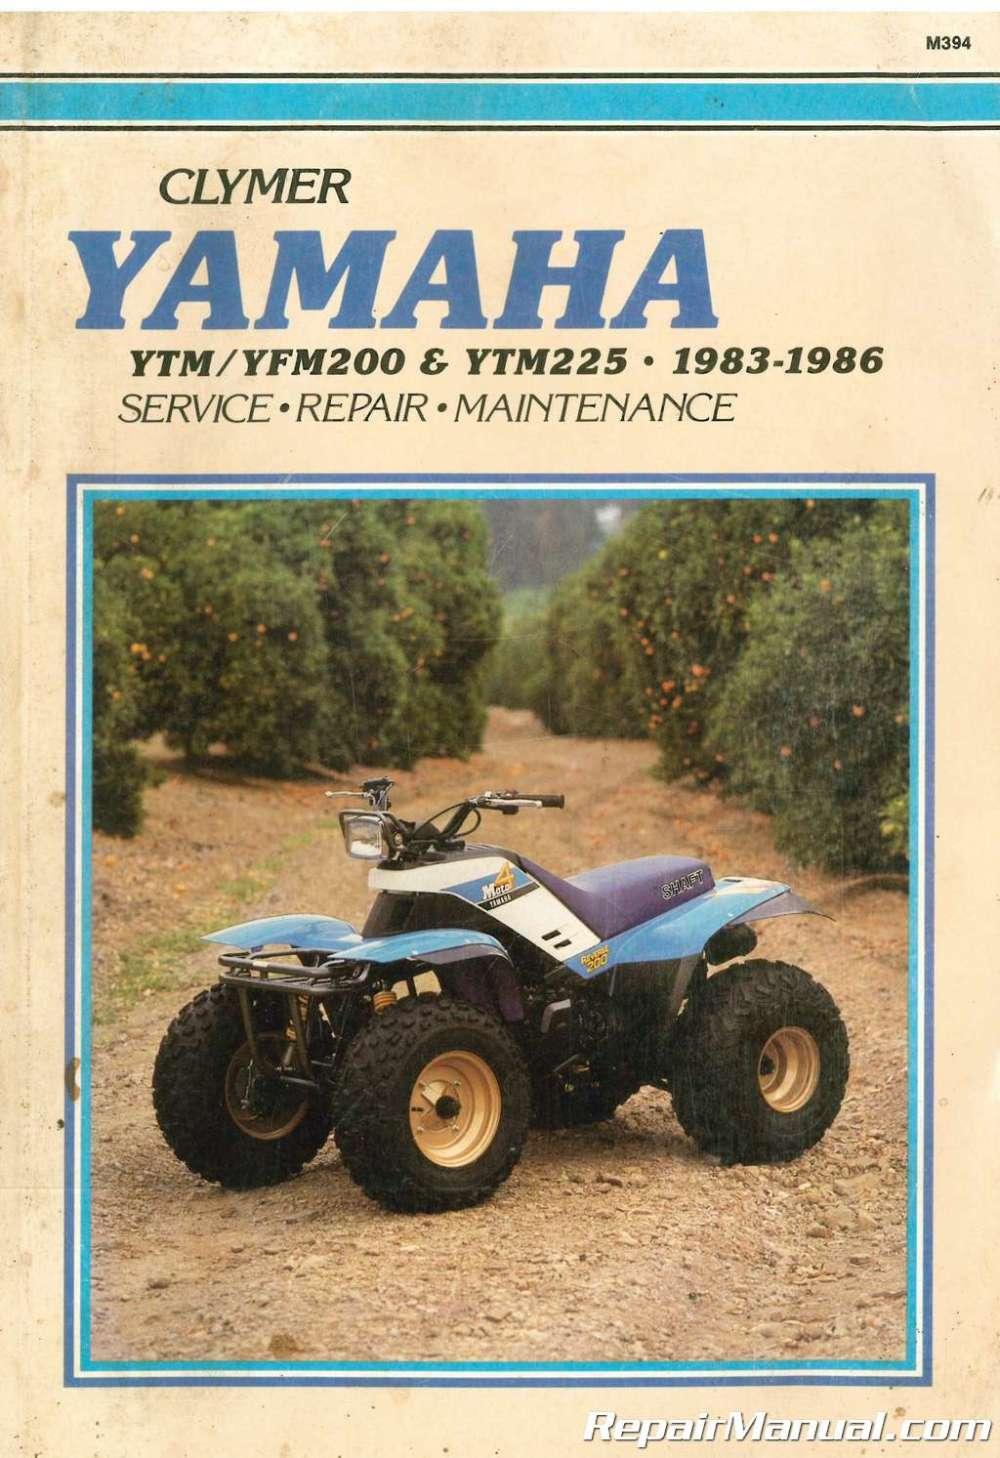 medium resolution of used clymer yamaha ytm200 ytm225 yfm200 1983 1986 repair diagram of 1986 moto4 yfm200dxs yamaha atv shift shaft diagram and